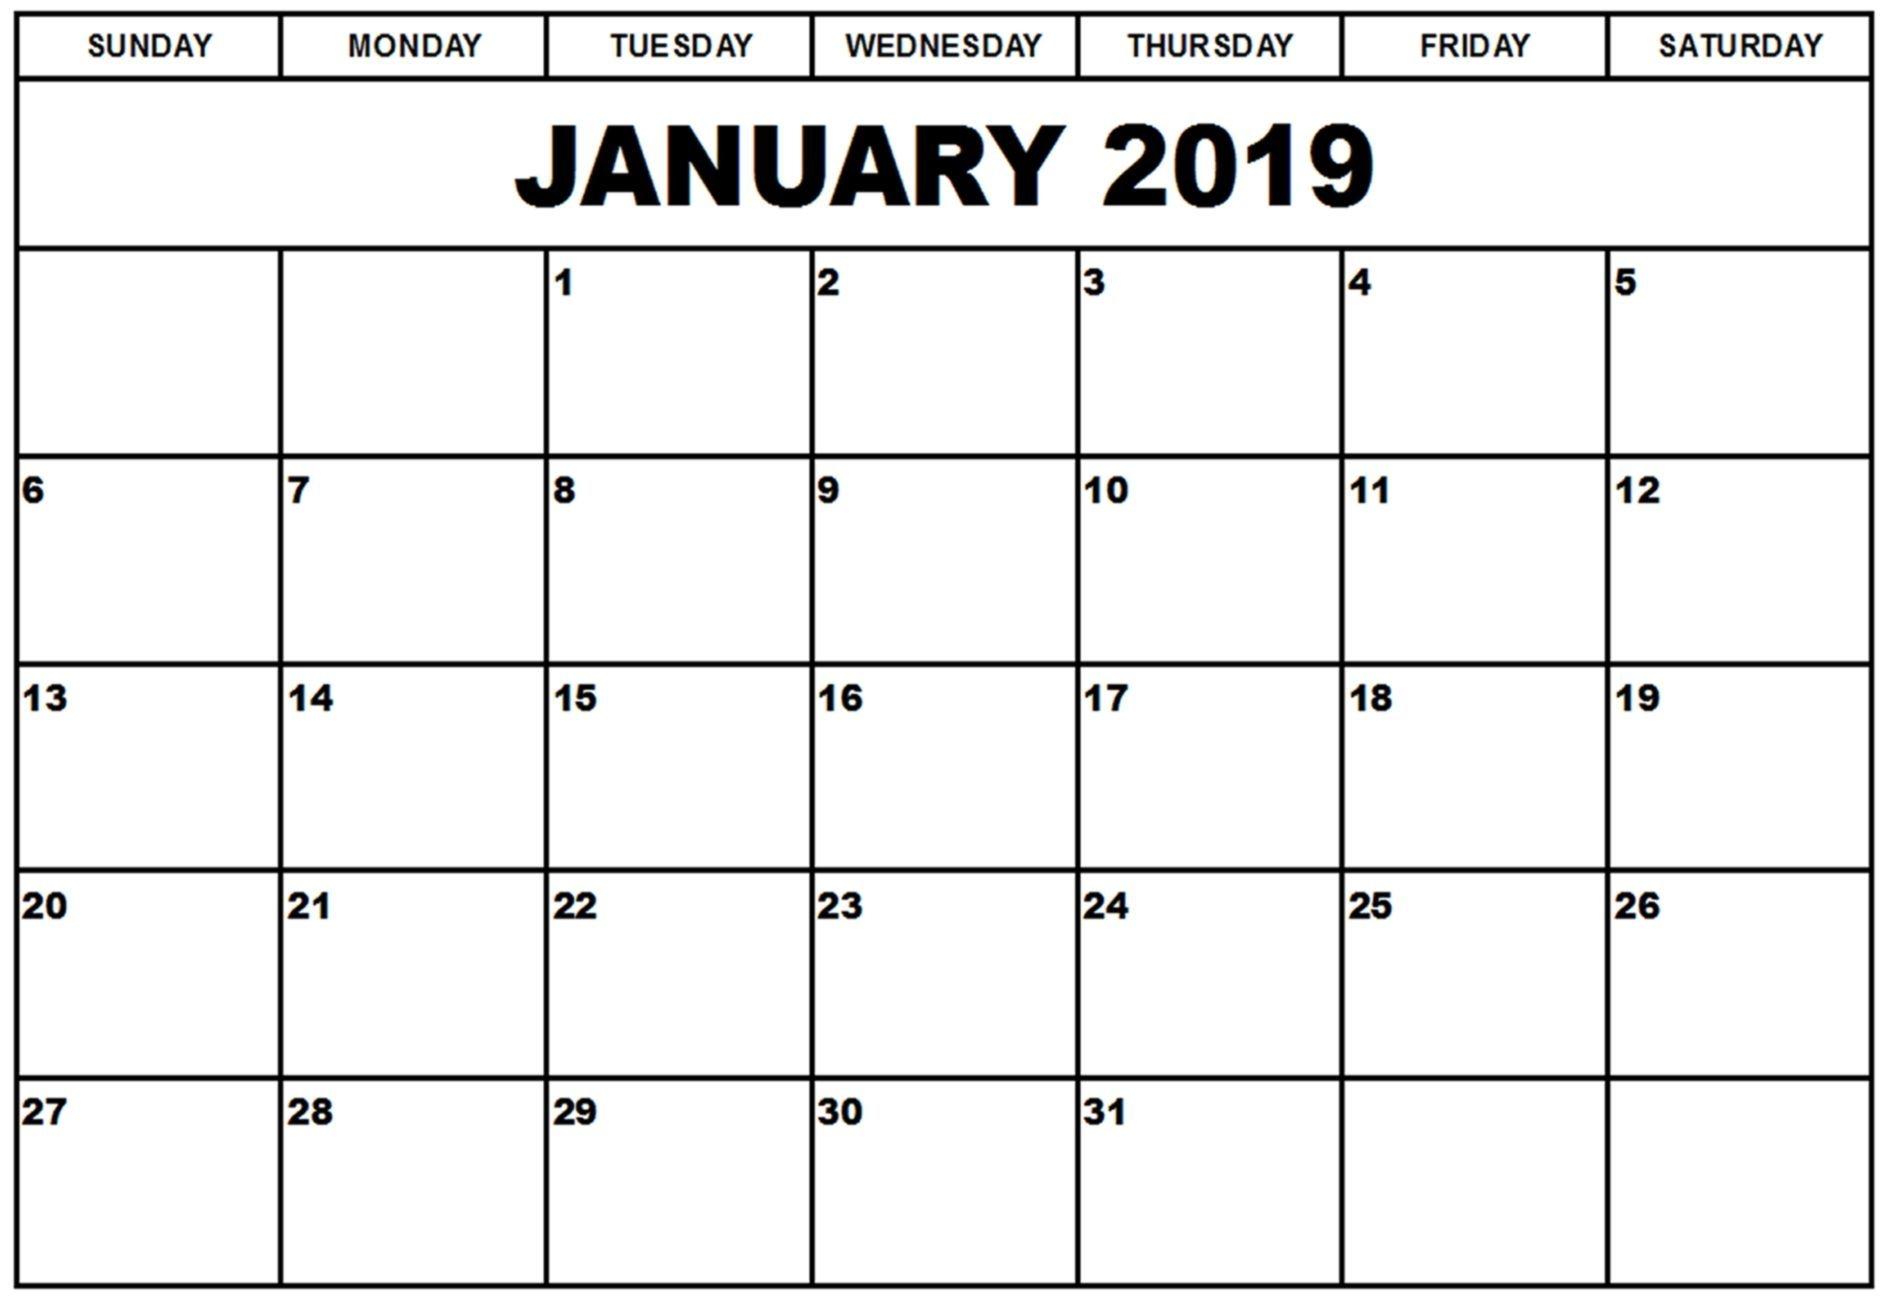 get free january 2019 editable calendar template [download